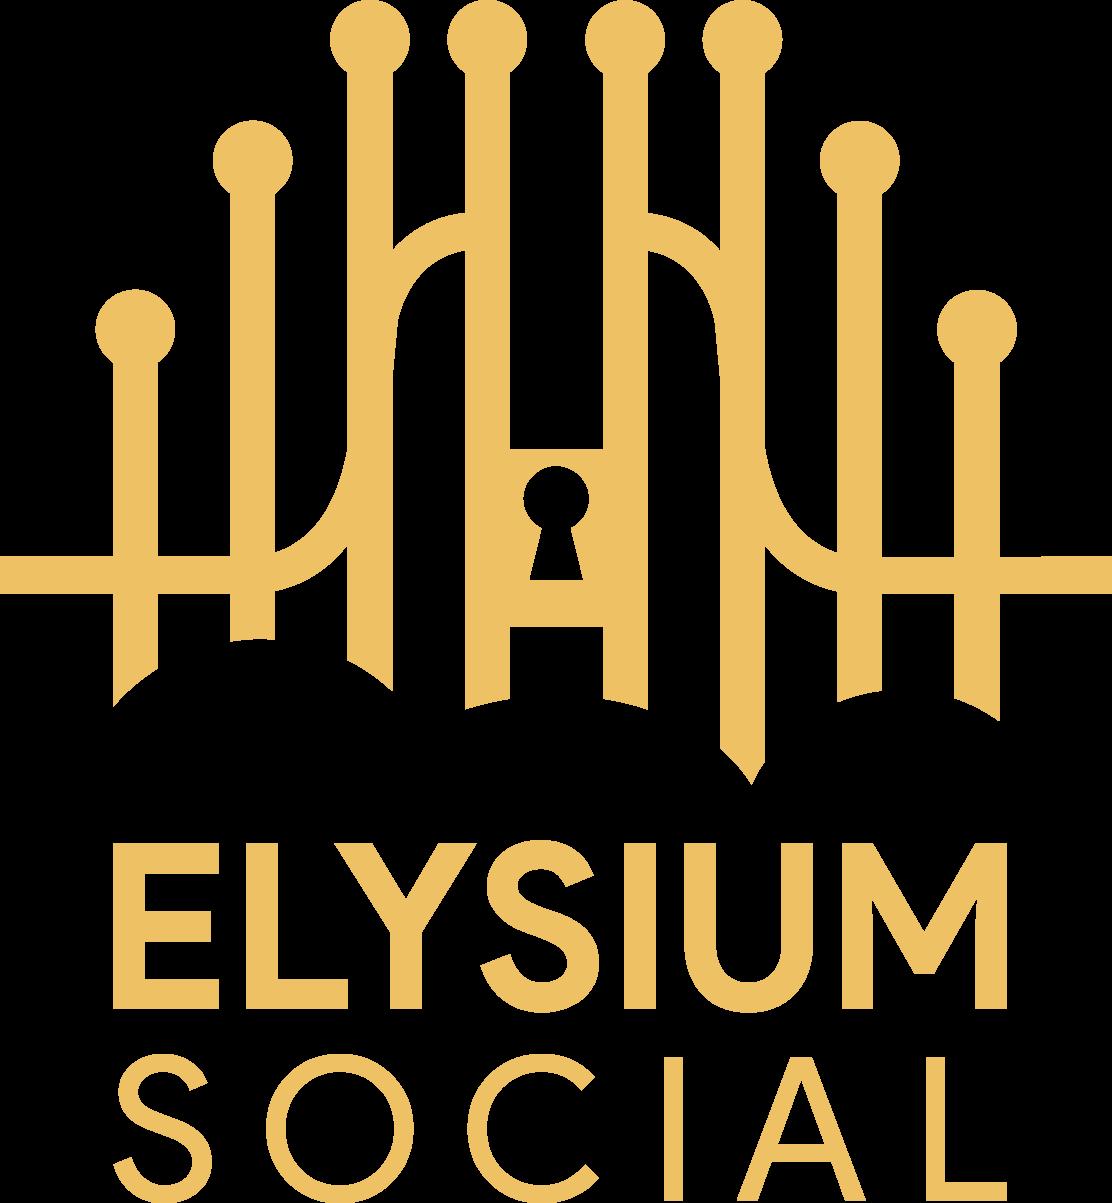 Elysium Social